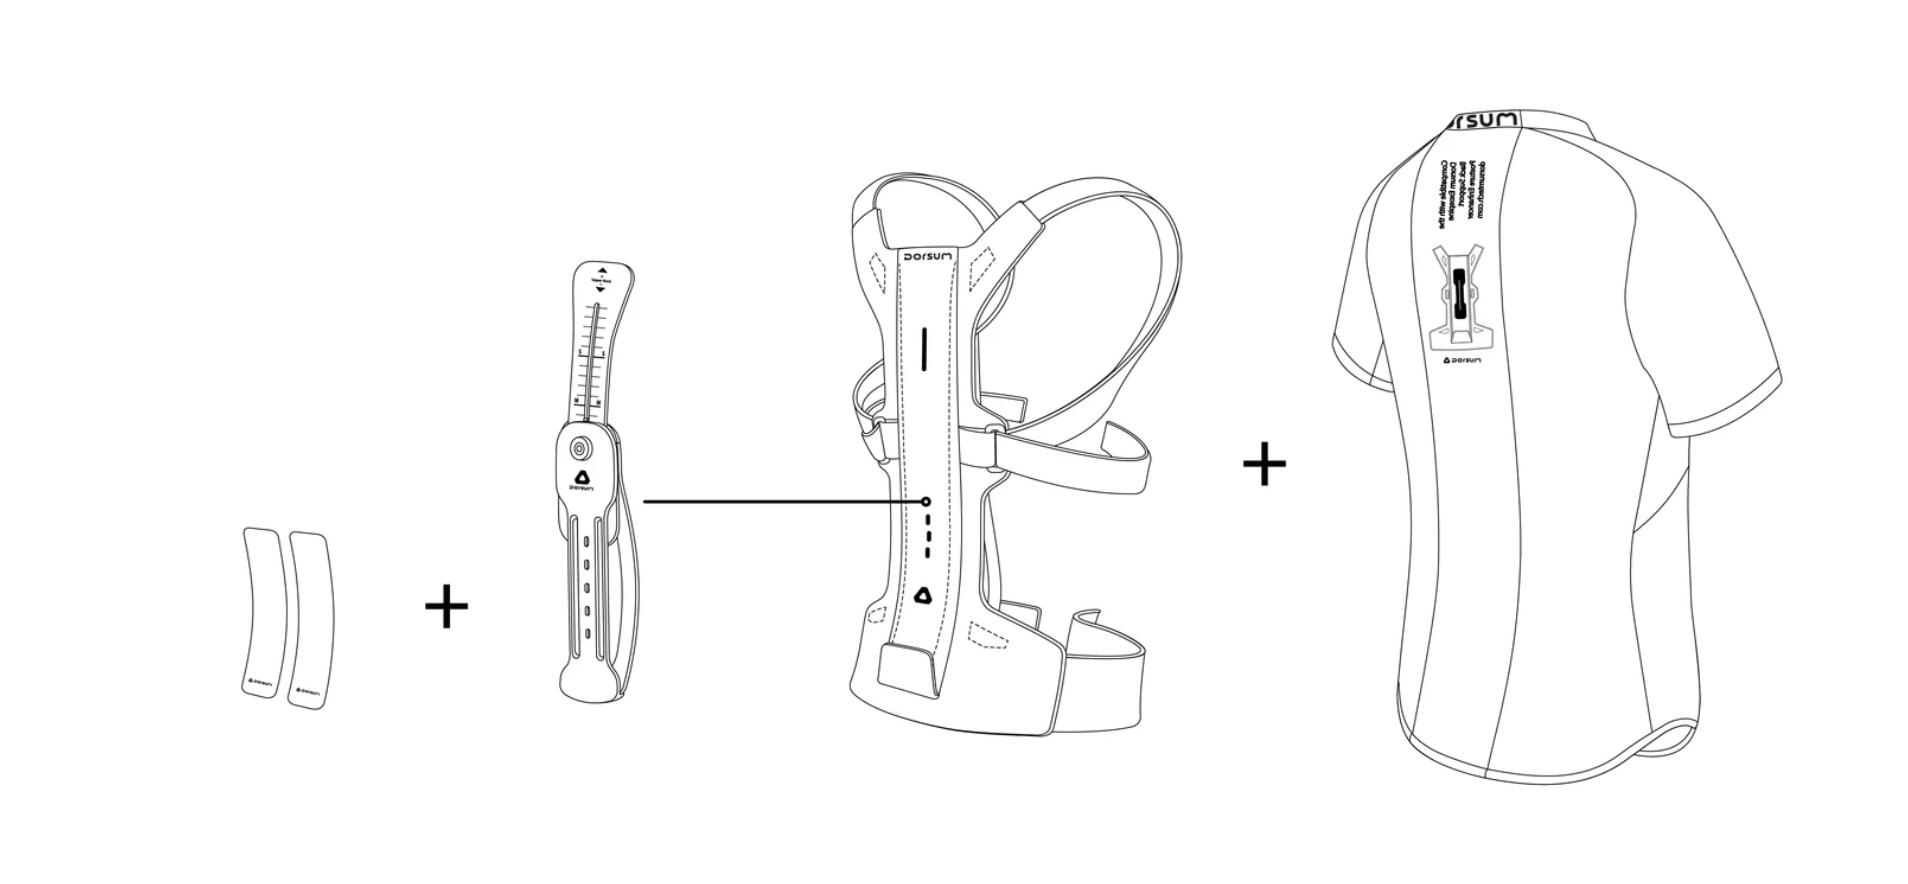 DorsumTech product schematic